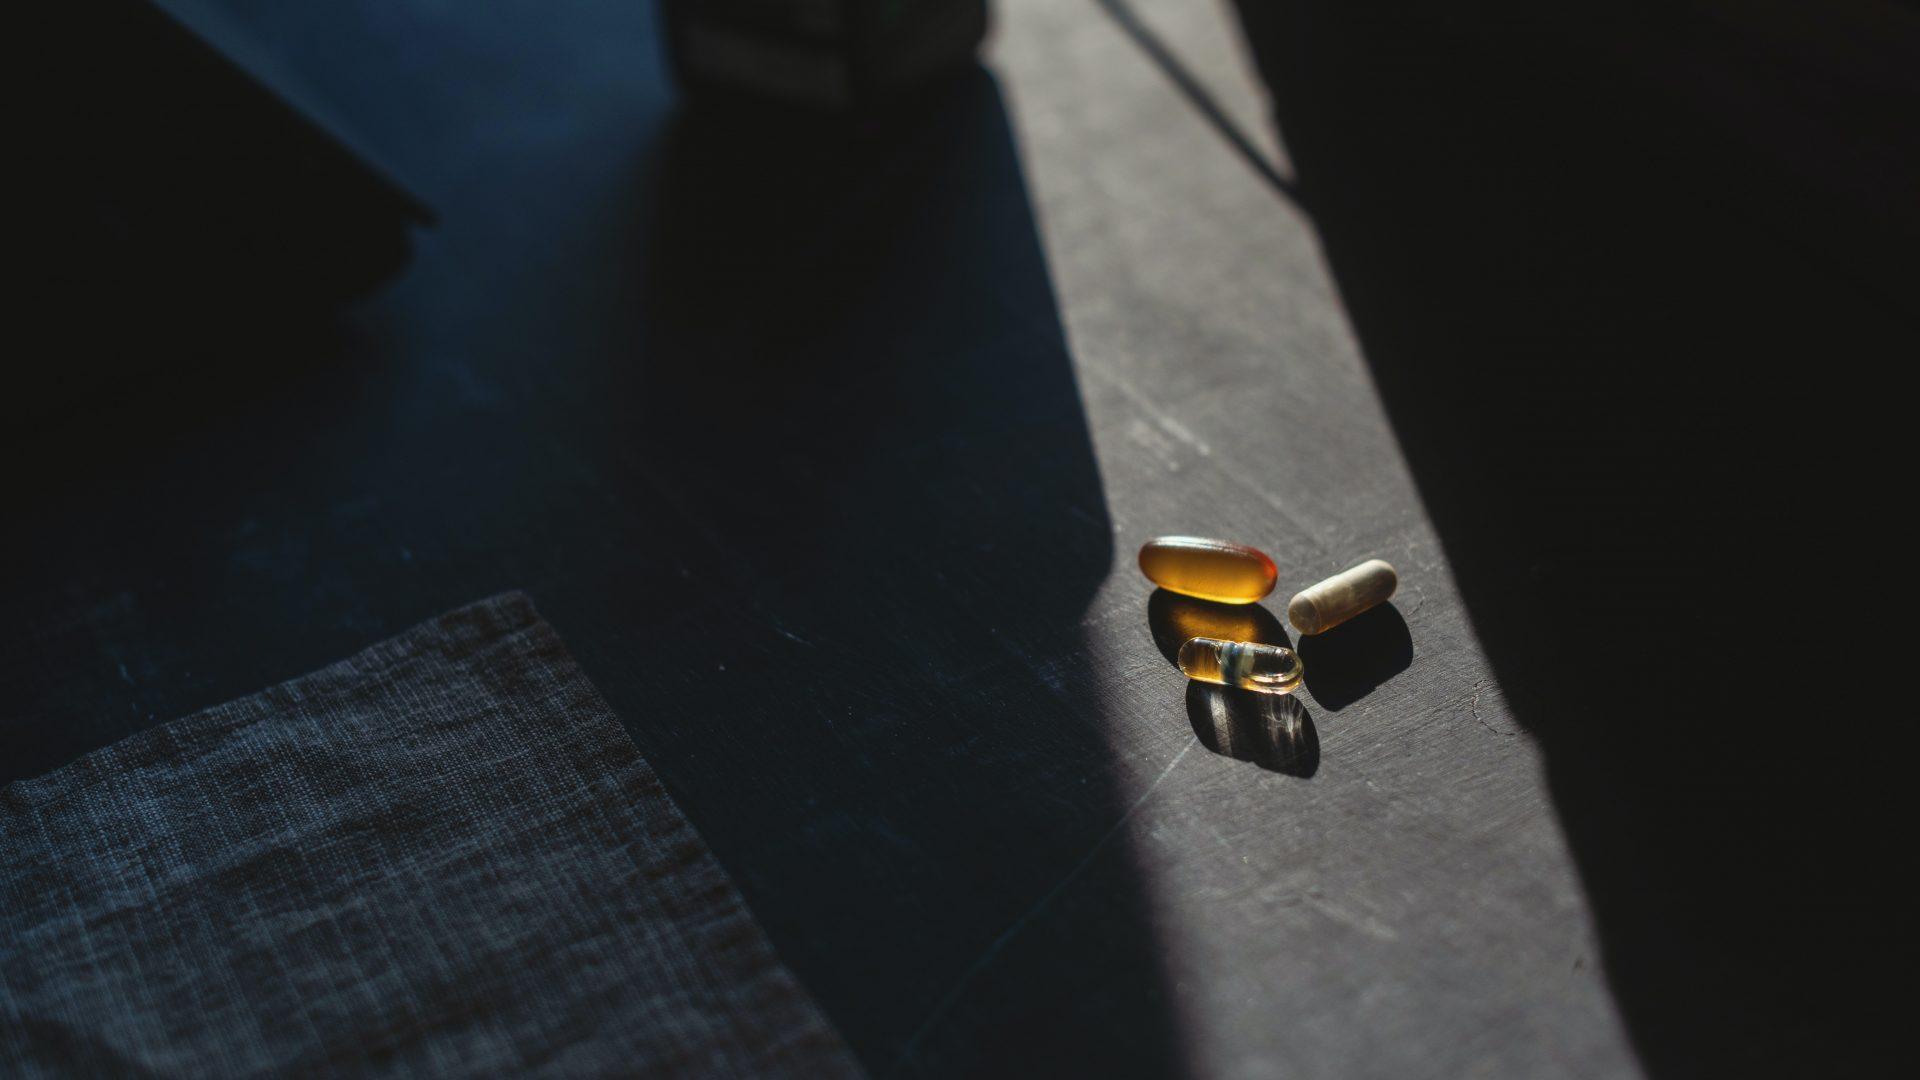 black and brown lego blocks